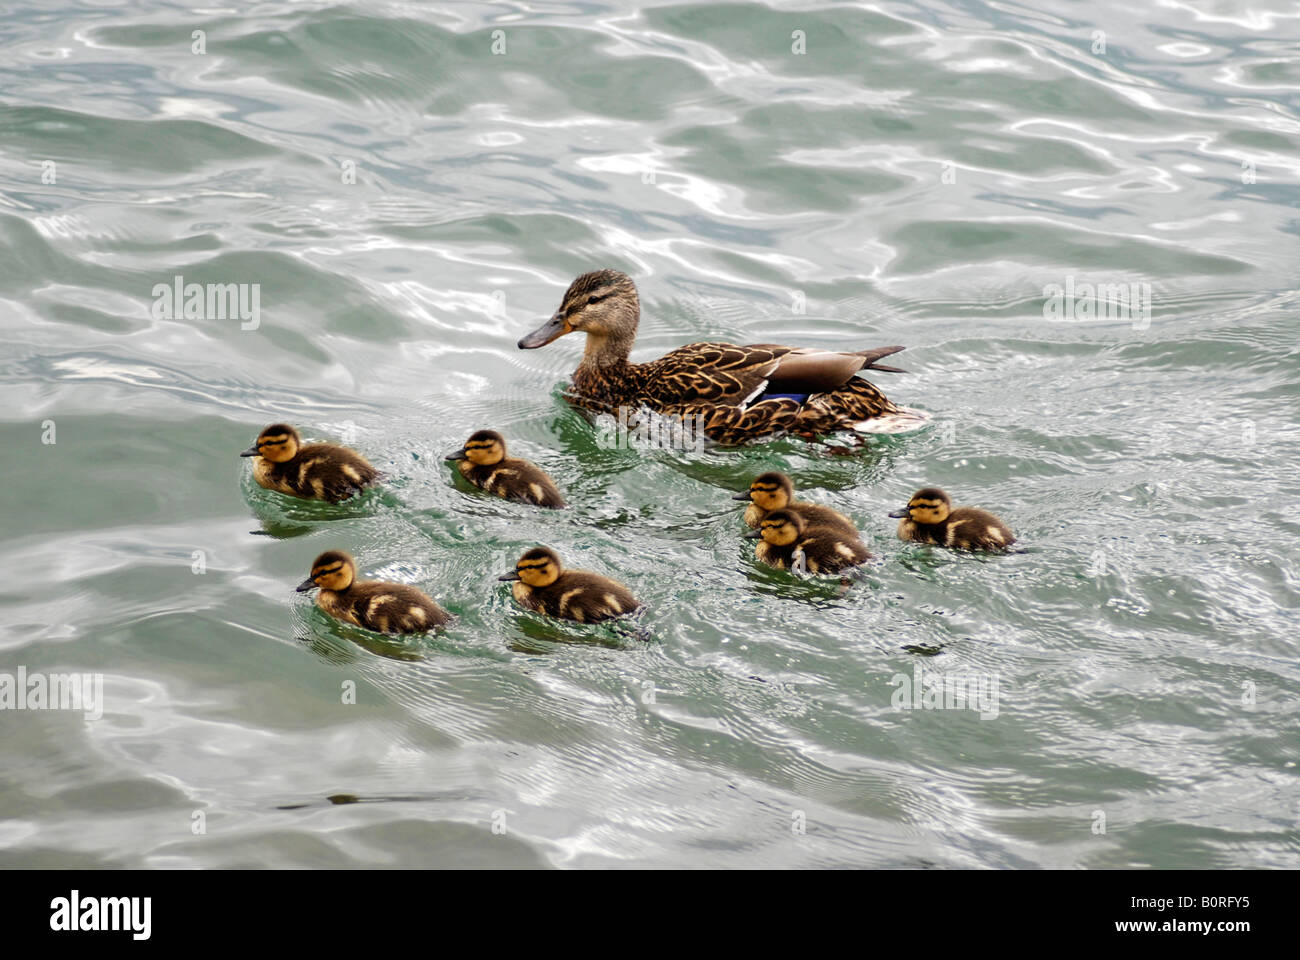 Mallard Duck with Ducklings - Stock Image